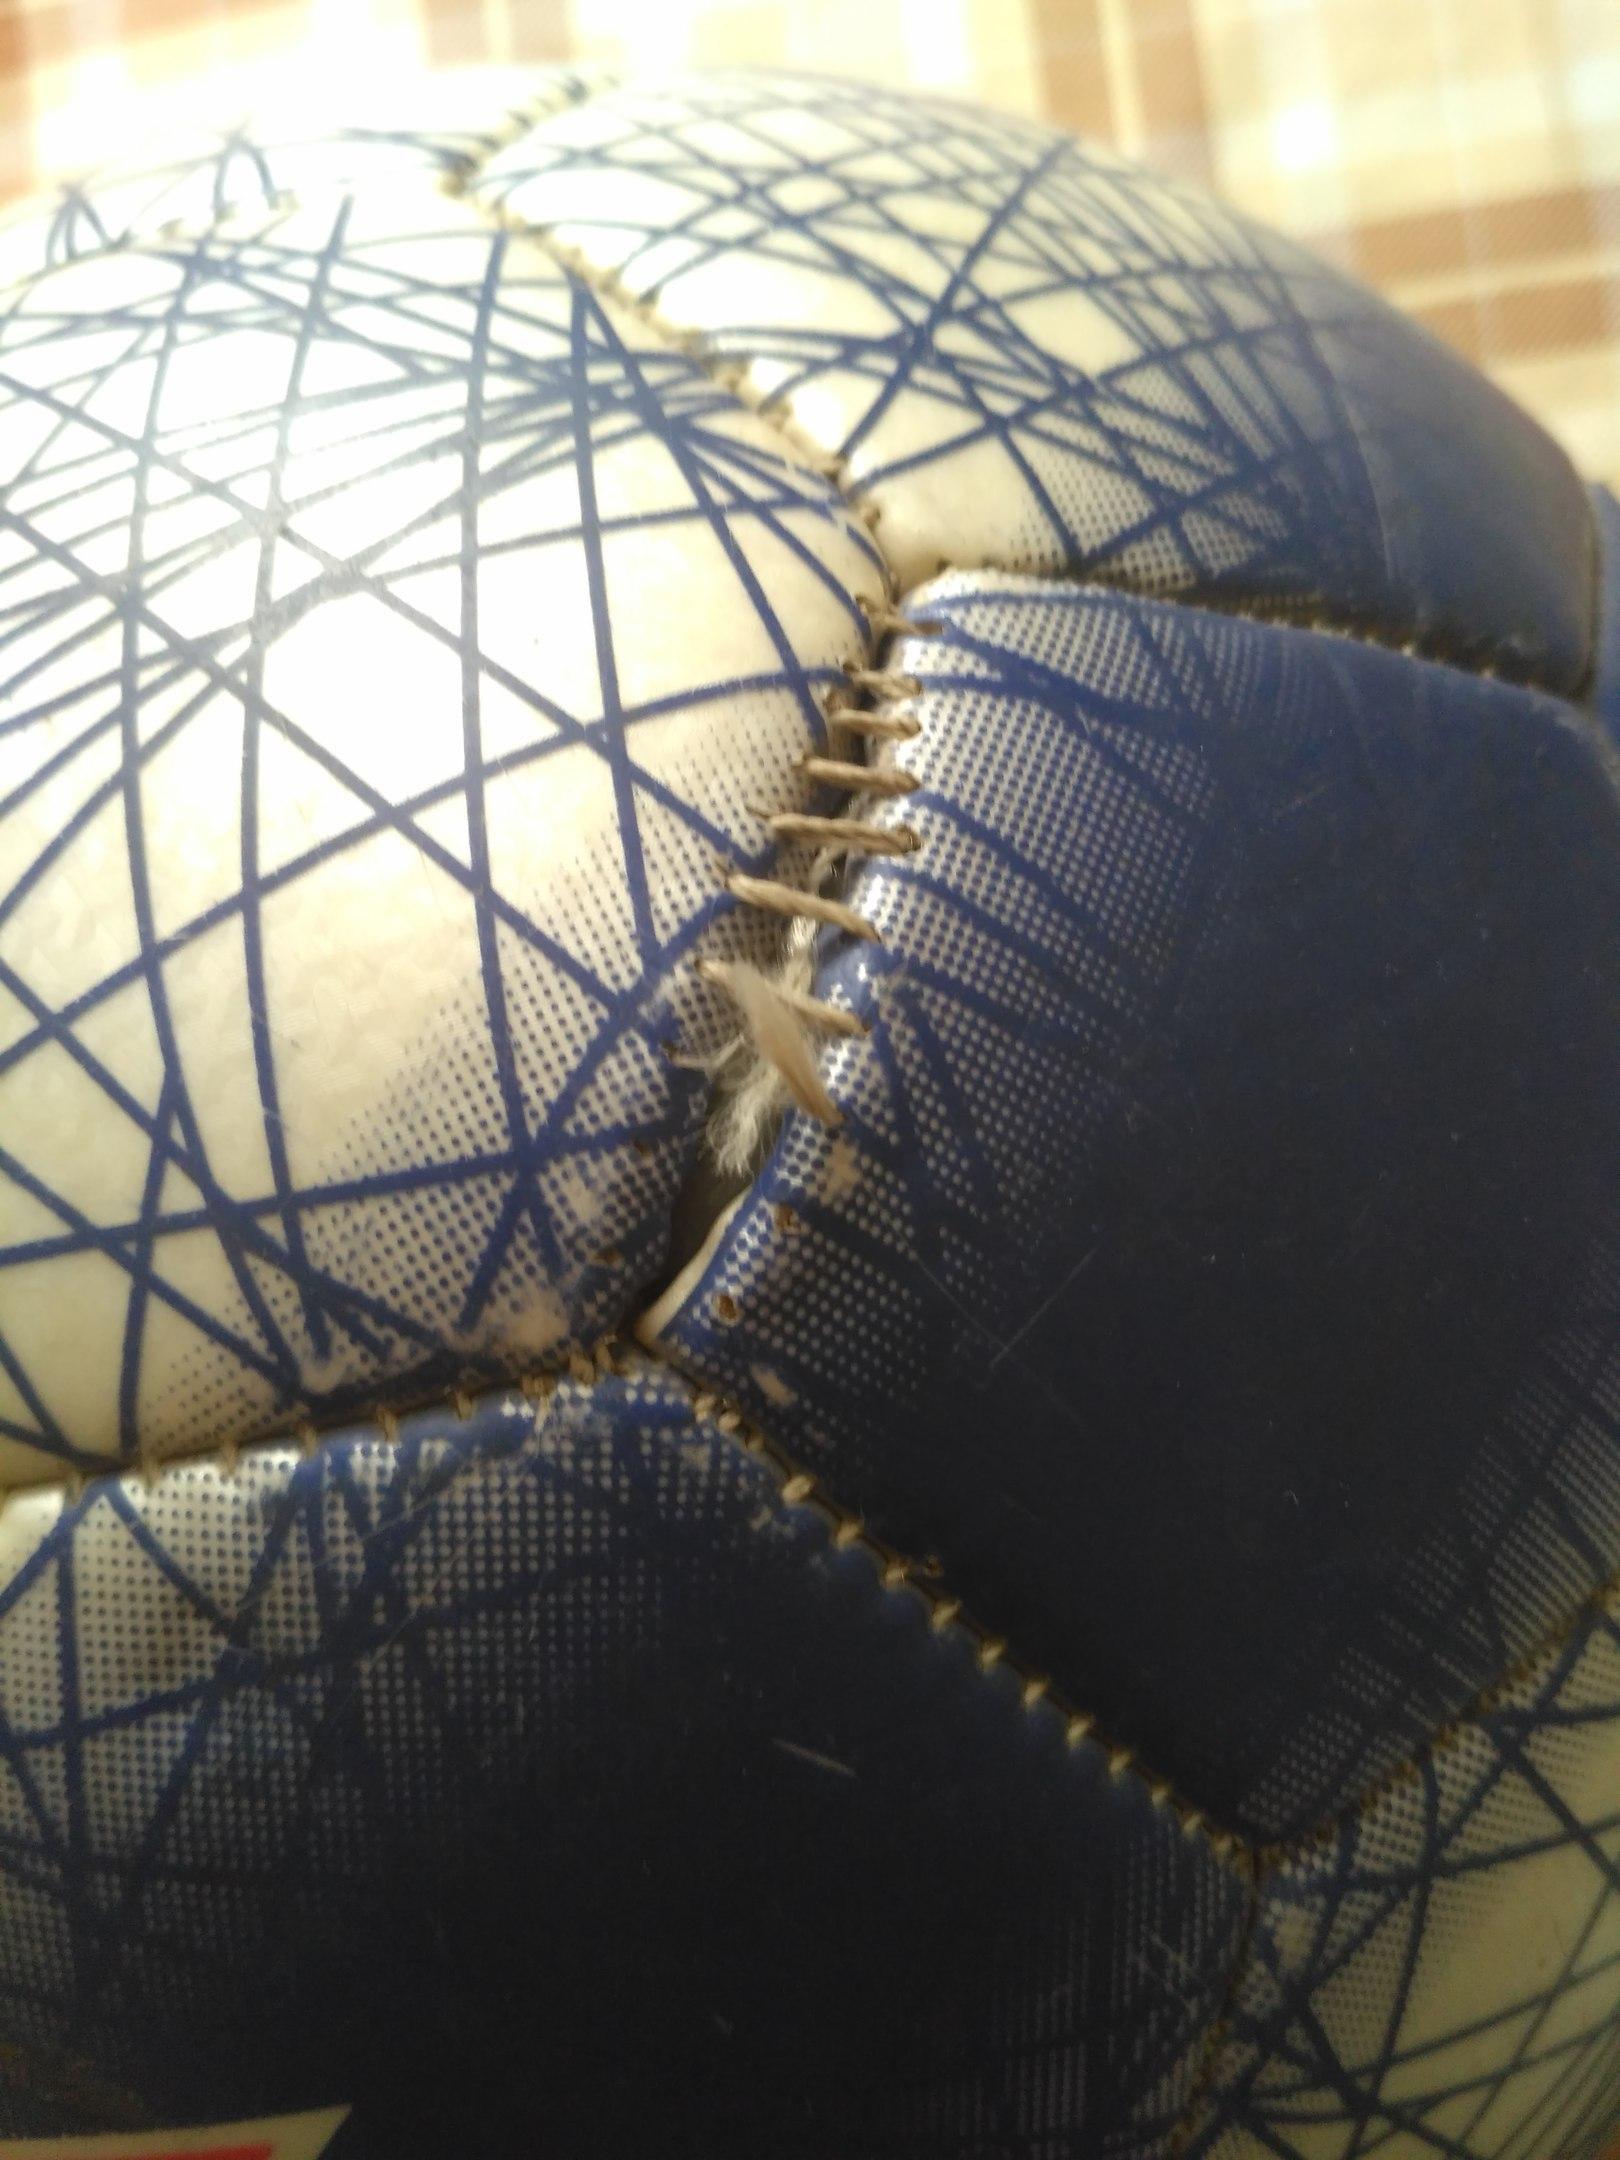 характер повреждений футбольного мяча